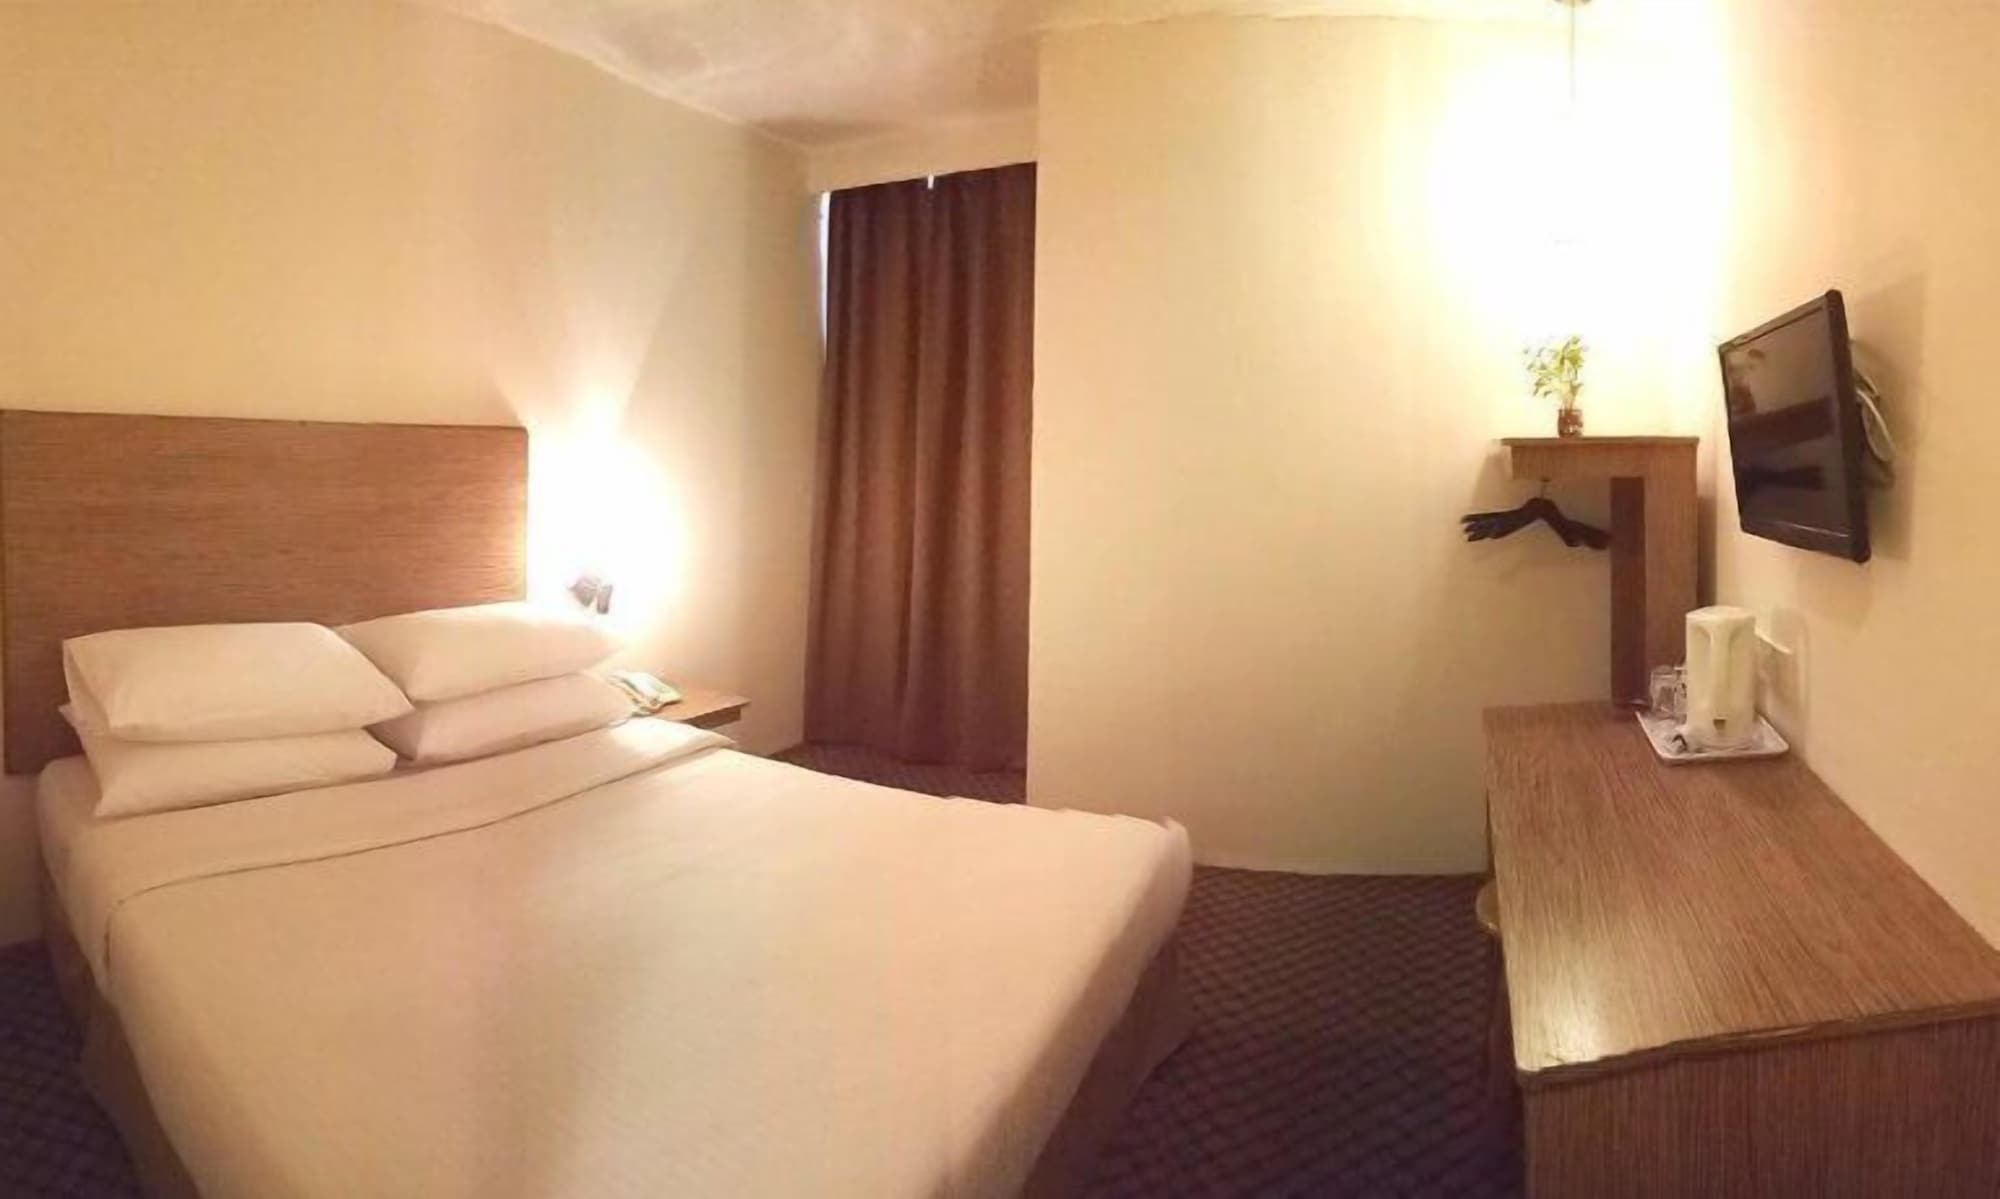 Hotel Zamburger Sunway Mentari, Kuala Lumpur